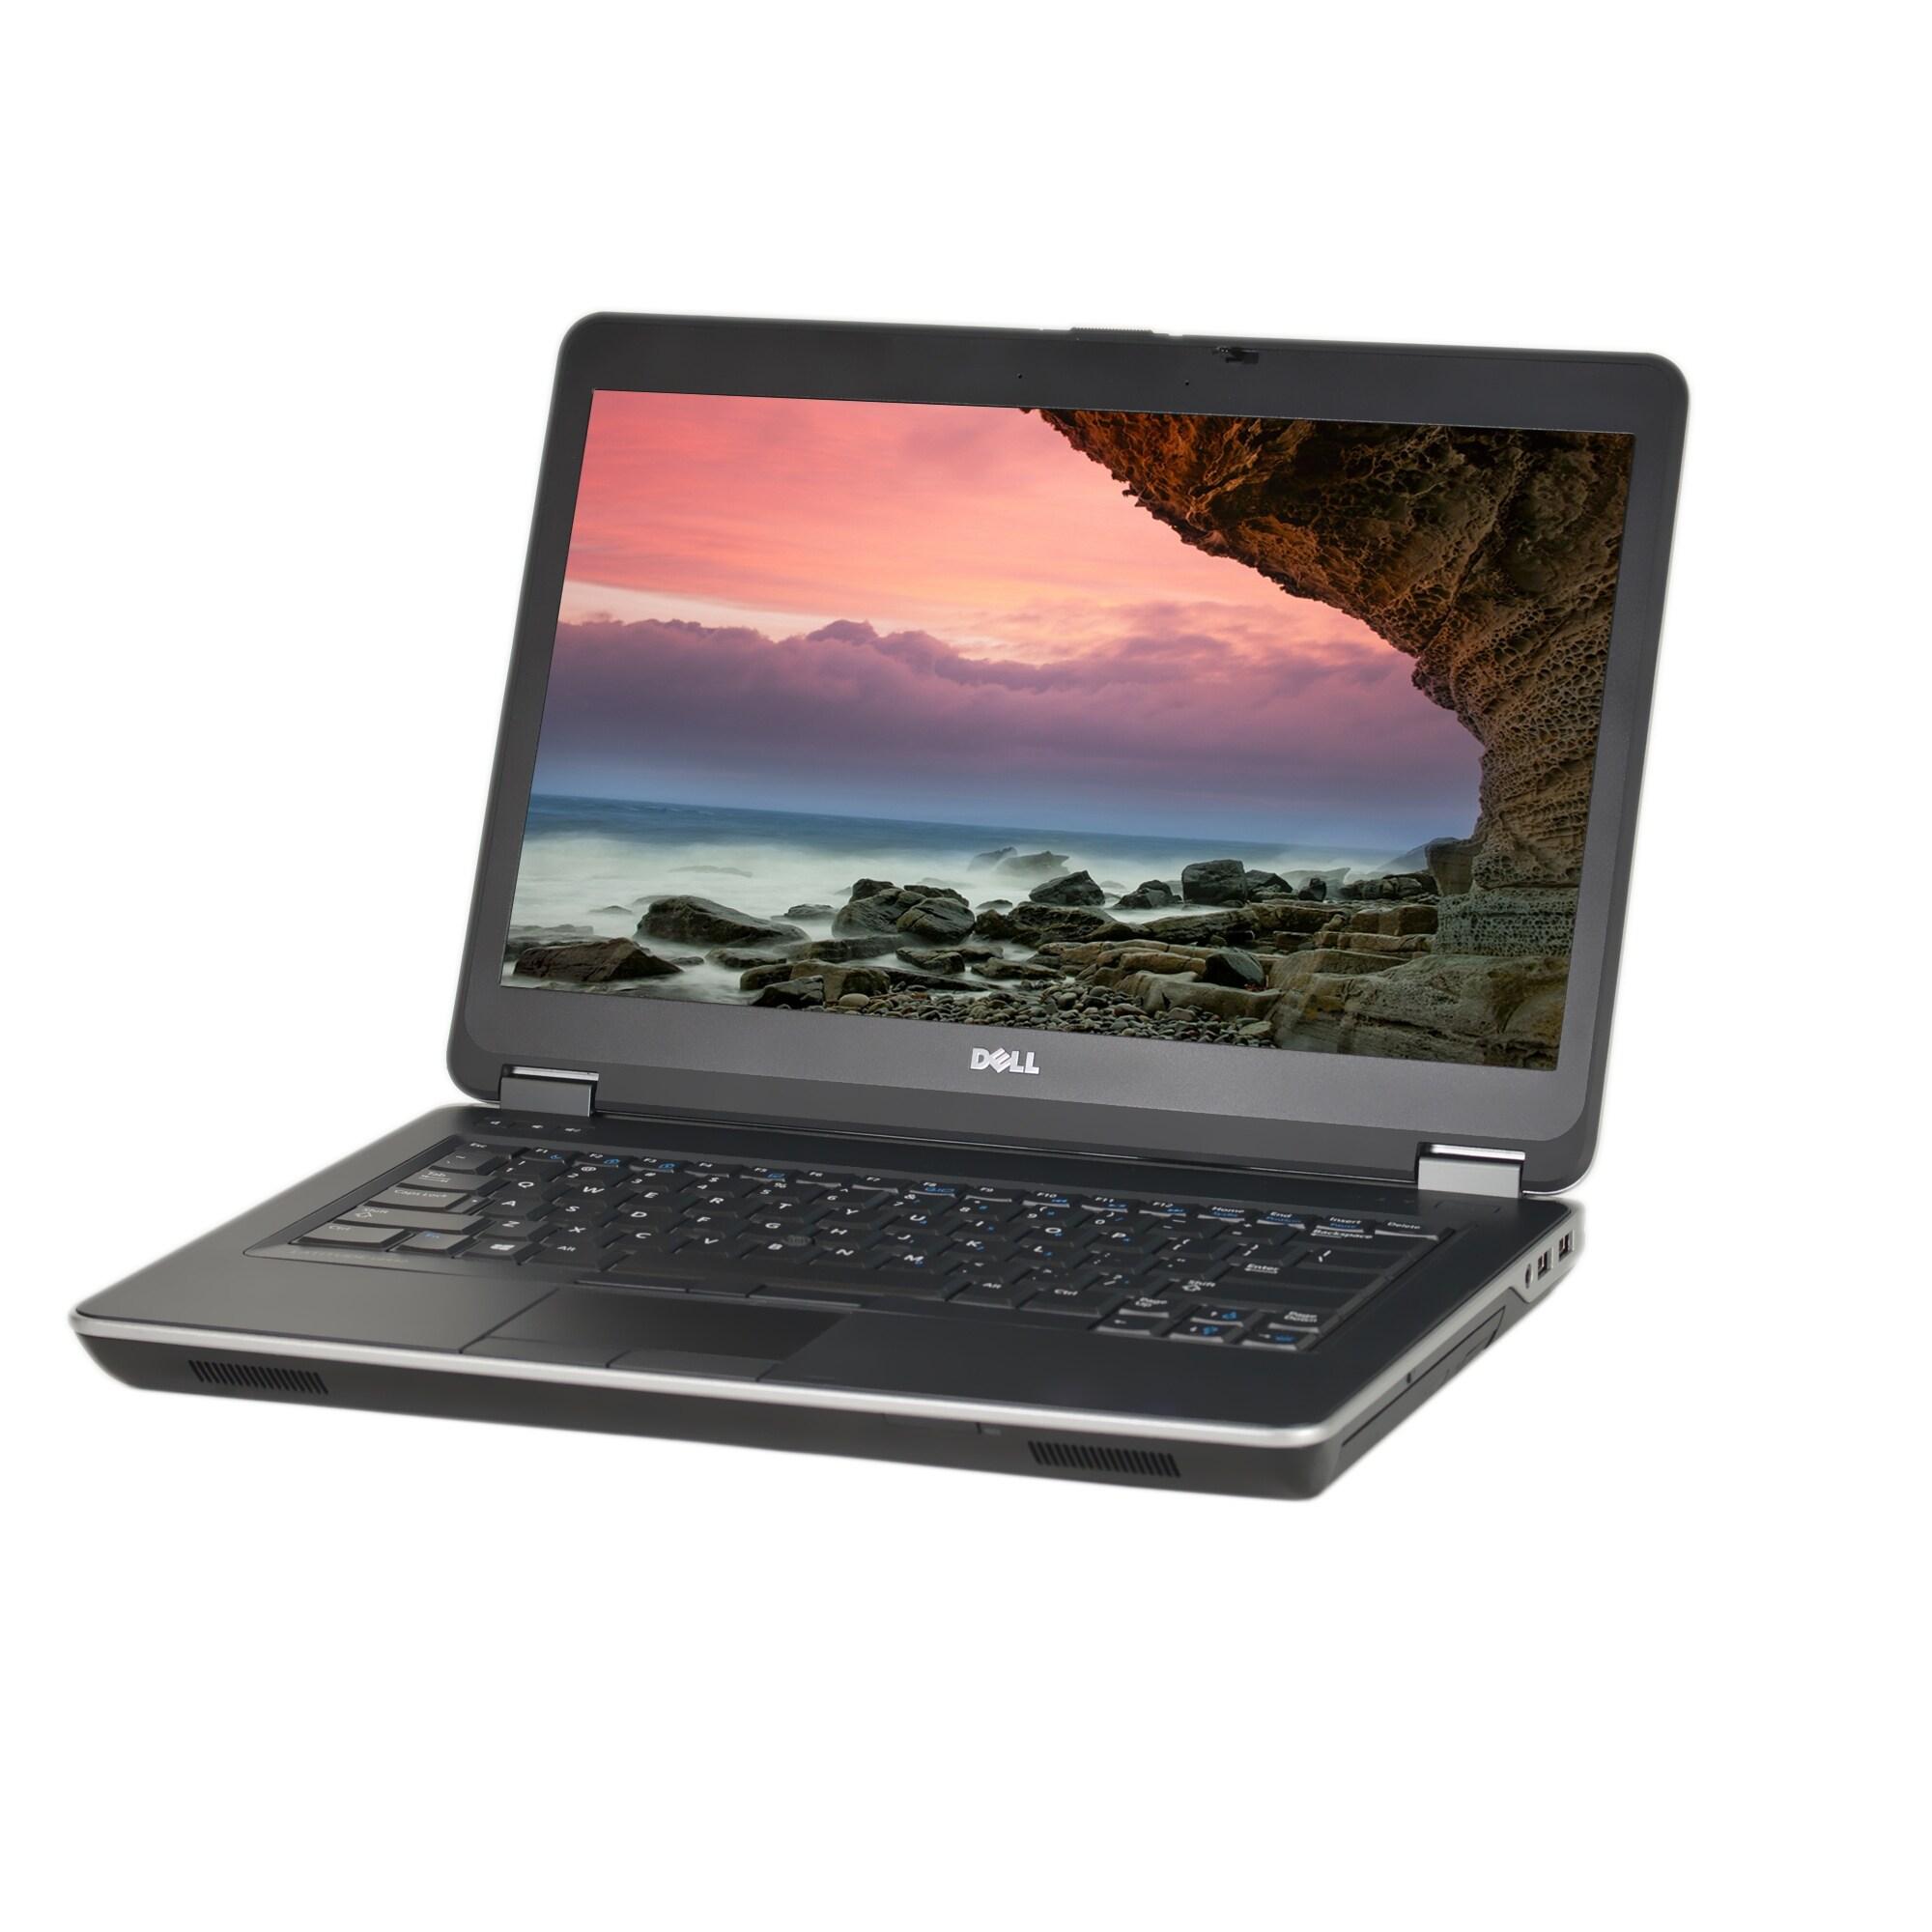 Dell Latitude E6440 Core i7-4600M 2 9GHz 4th Gen CPU 8GB RAM 500GB HDD  Windows 10 Pro 14-inch Laptop (Refurbished)